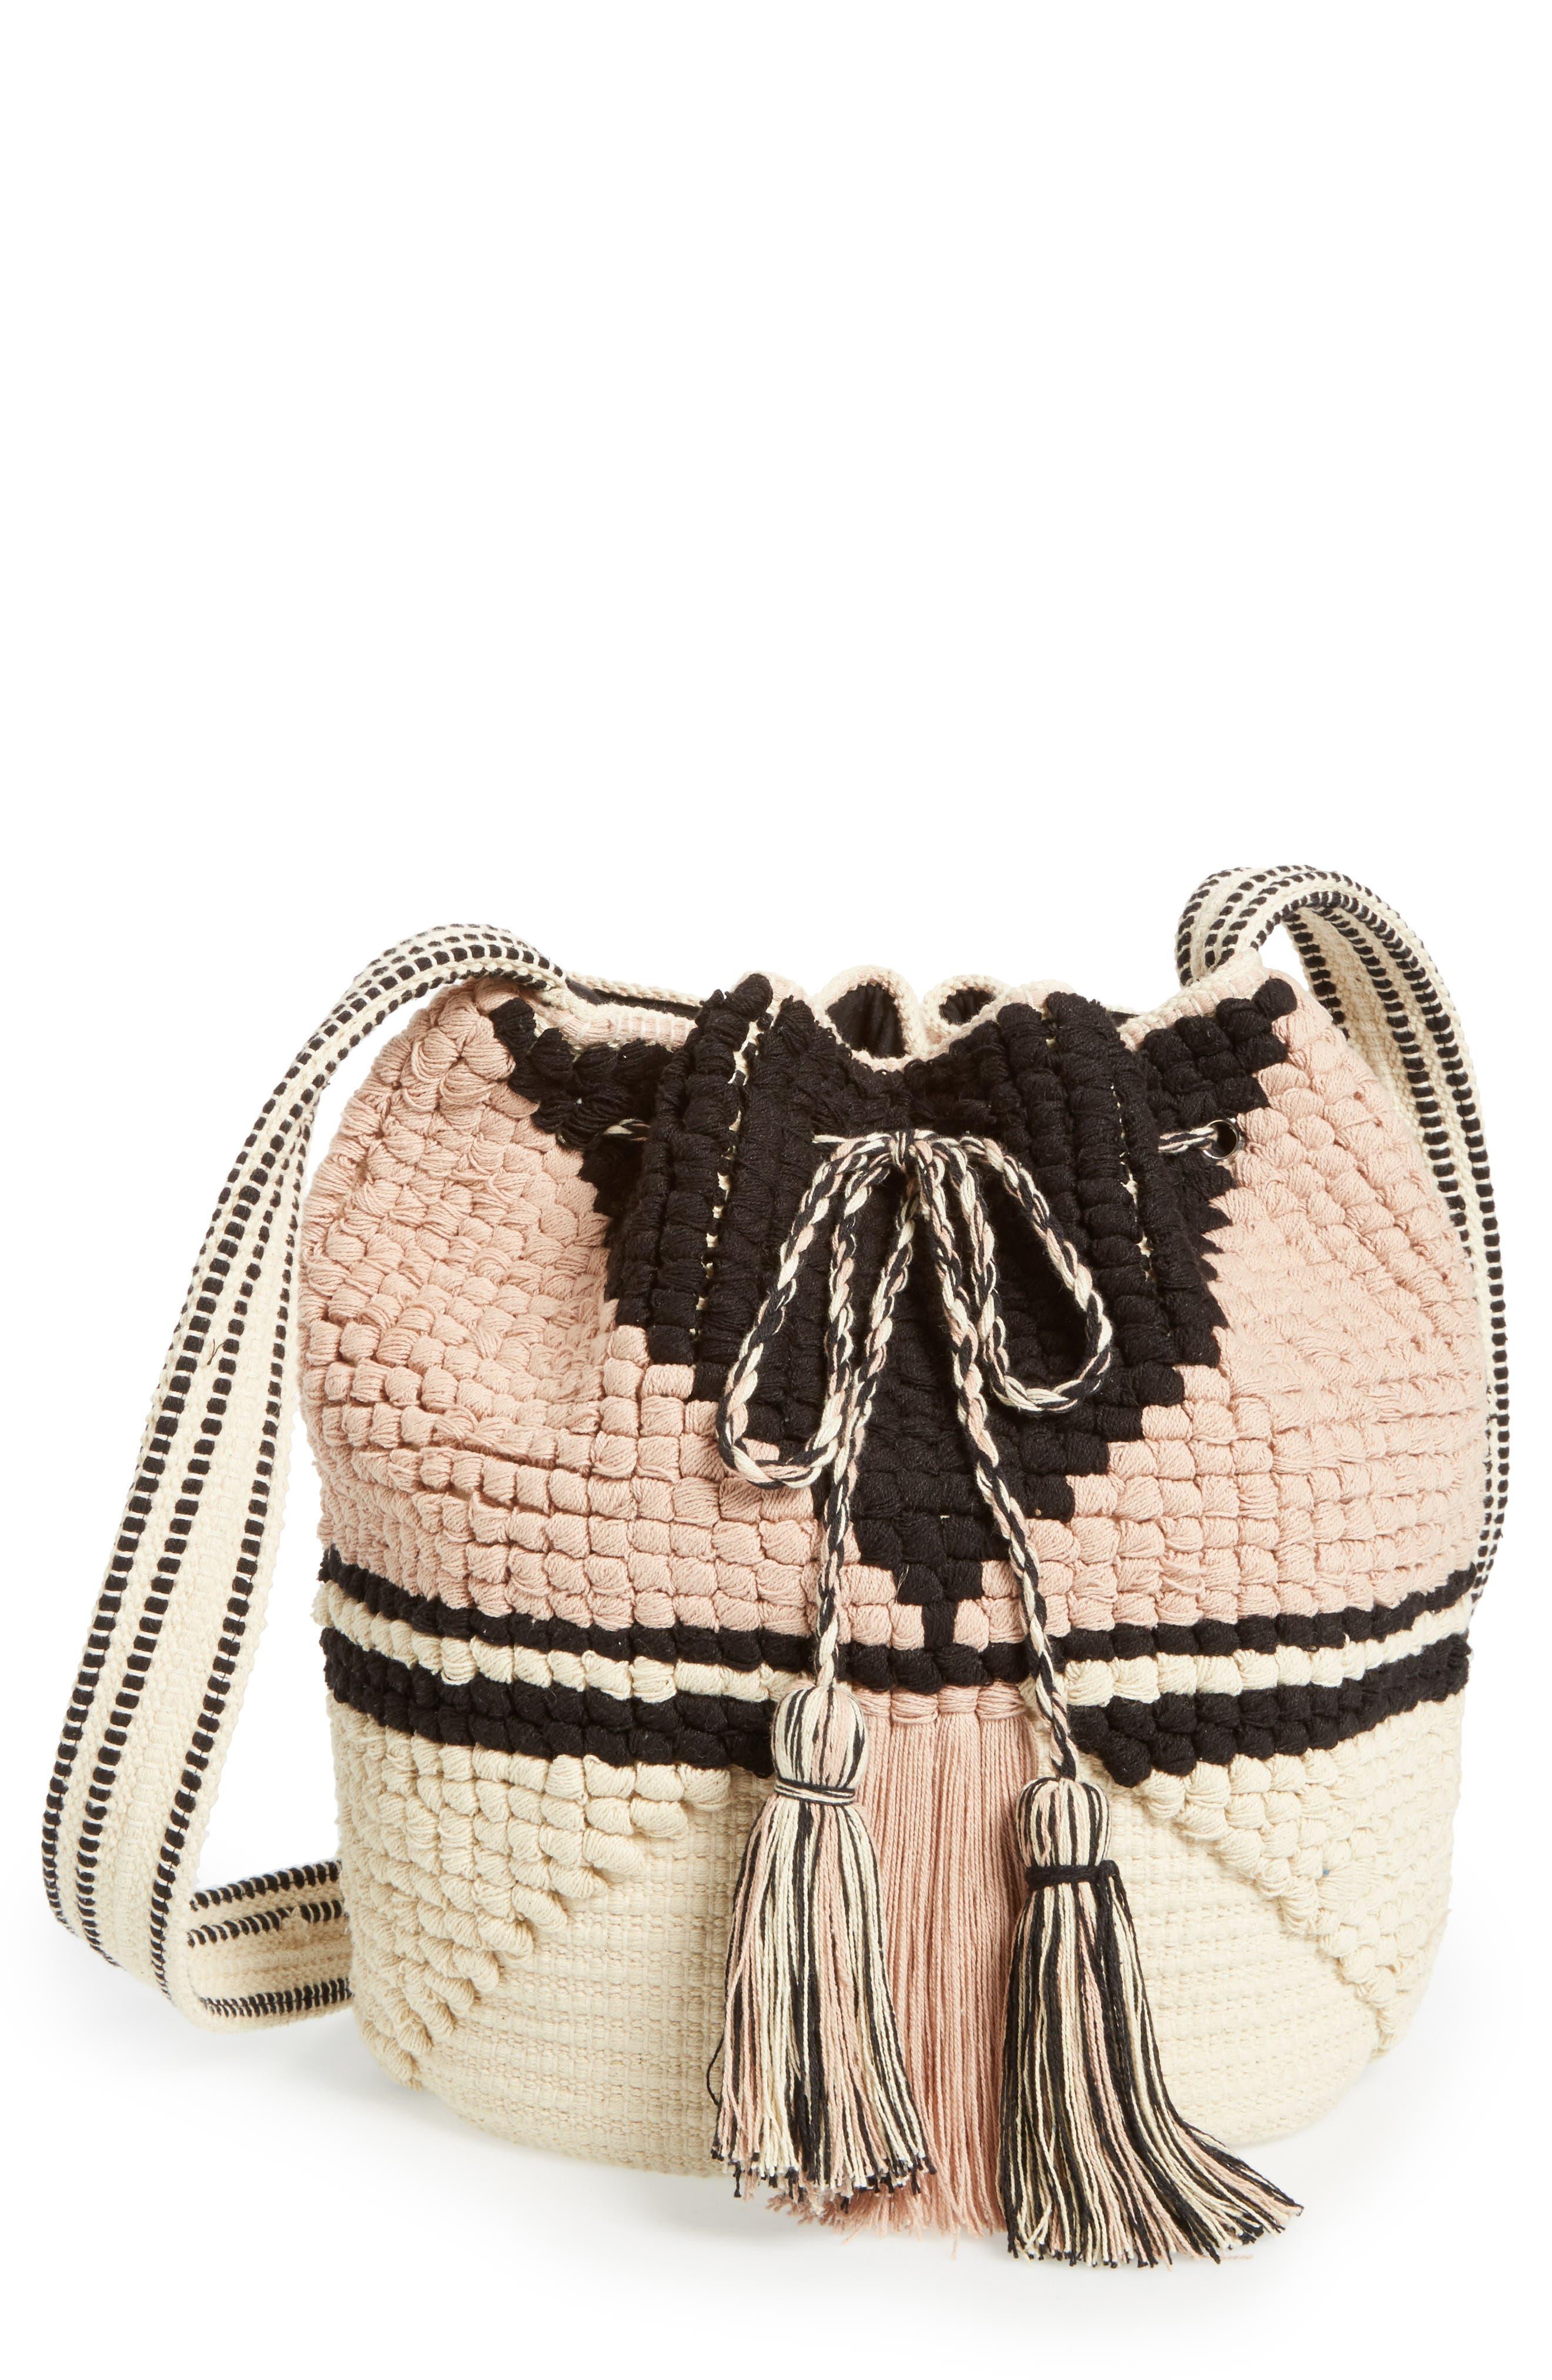 Alternate Image 1 Selected - Sole Society Kenya Bucket Bag